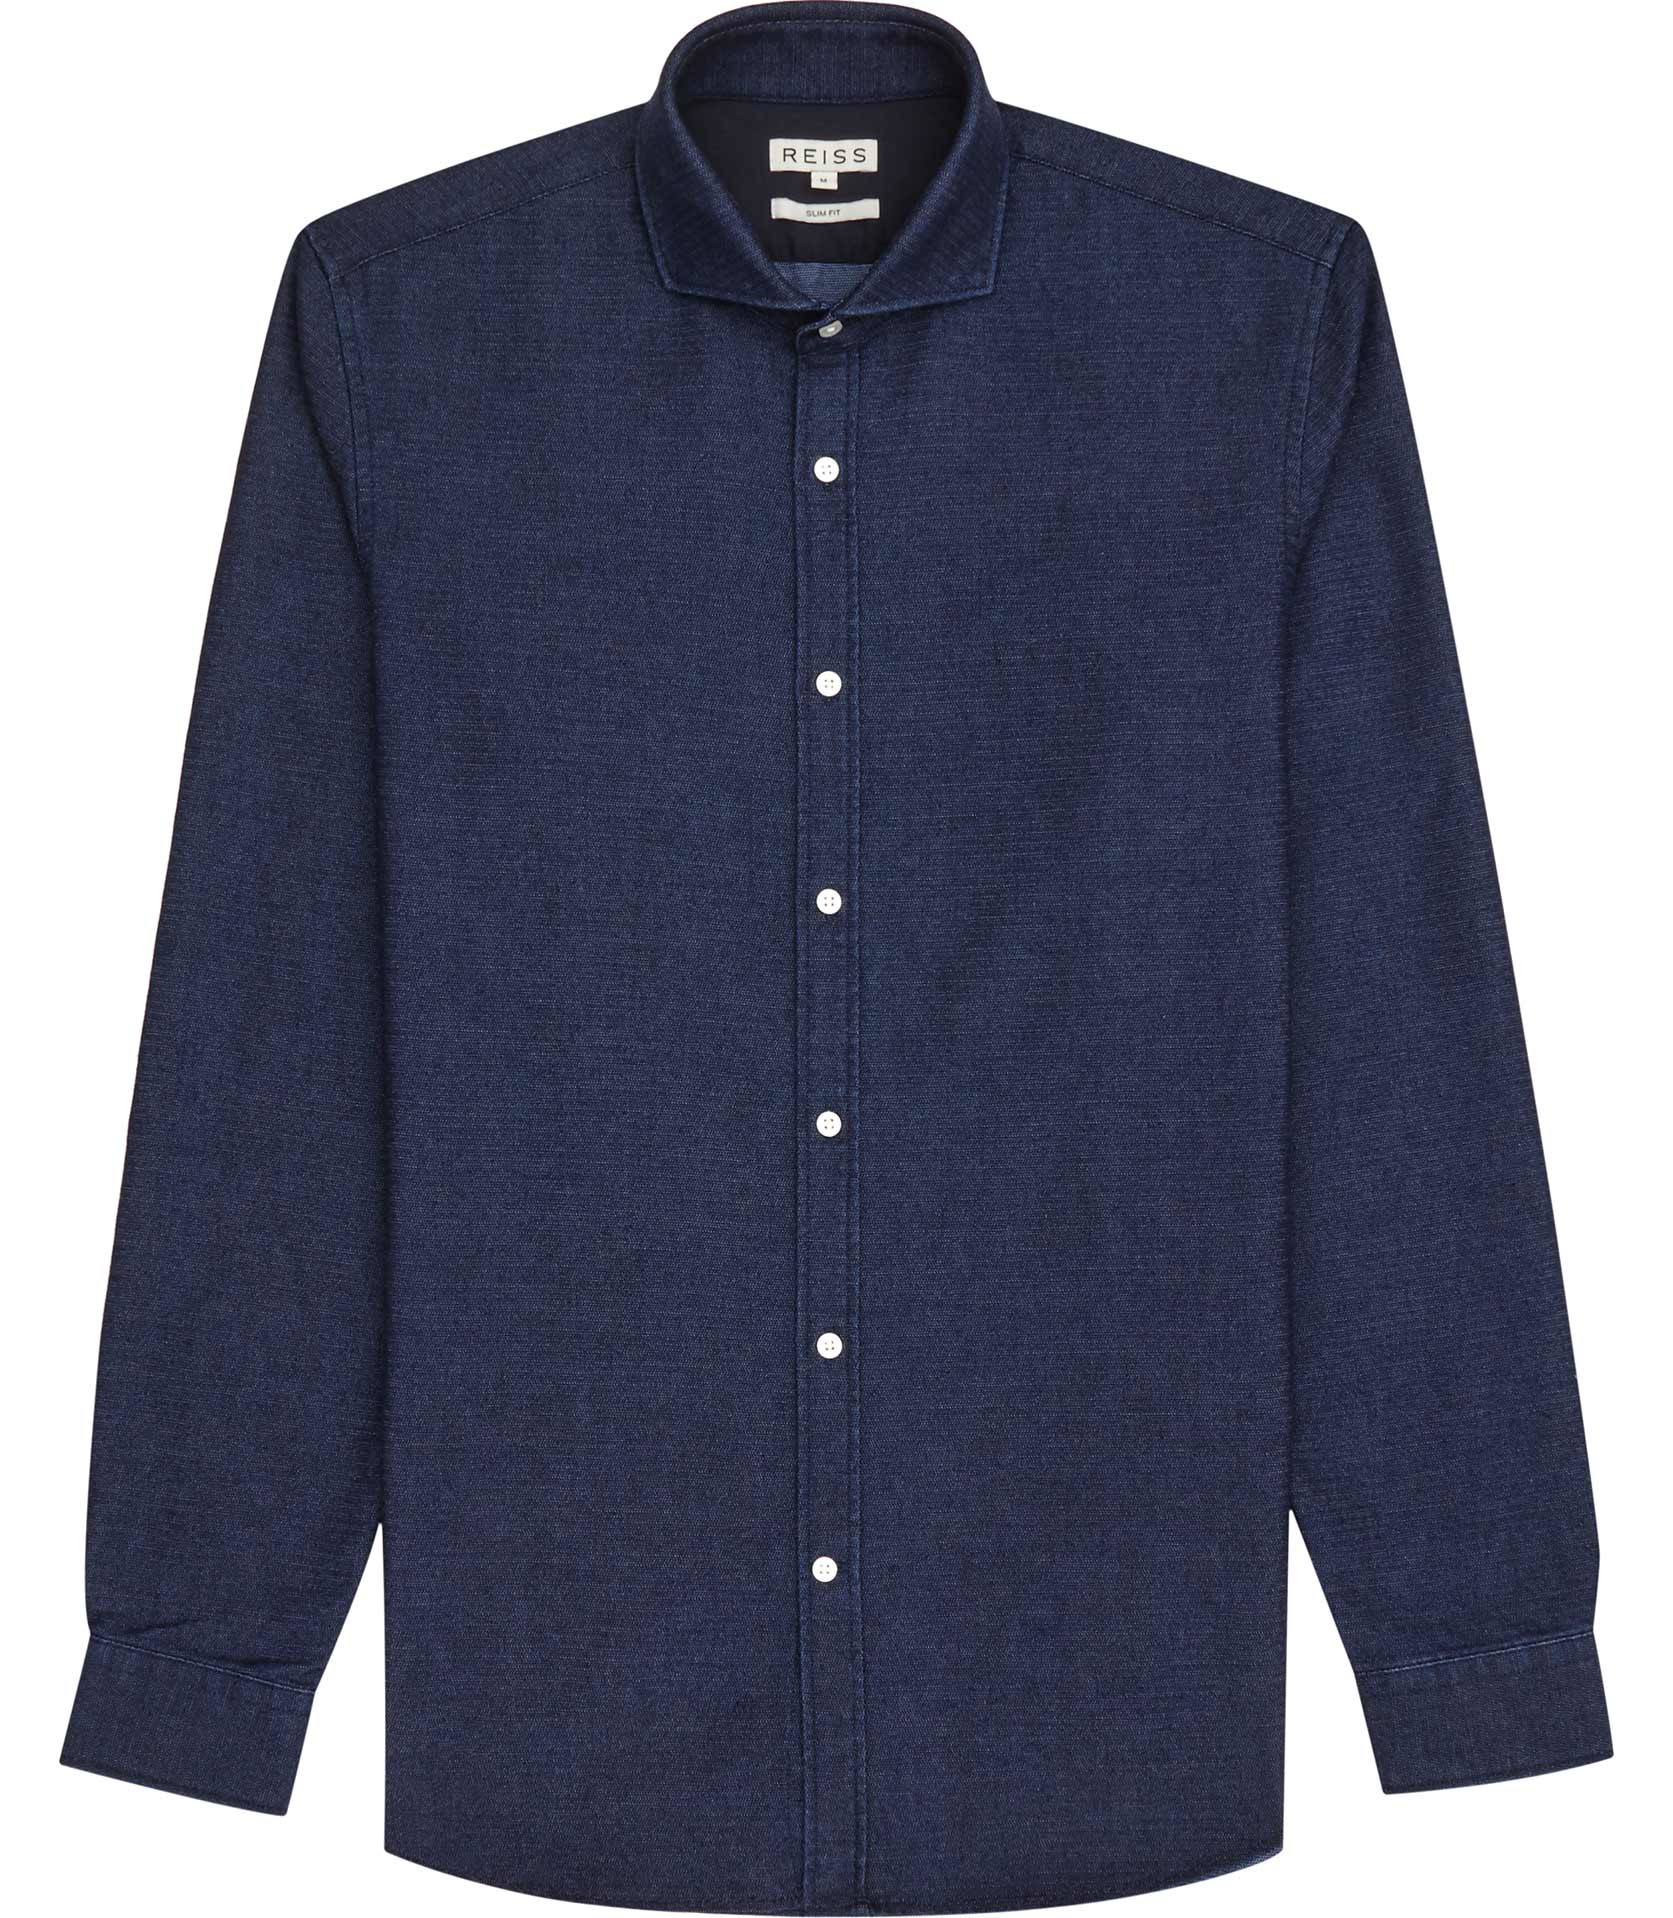 Reiss Fabrizio Cutaway Collar Shirt In Blue For Men Lyst